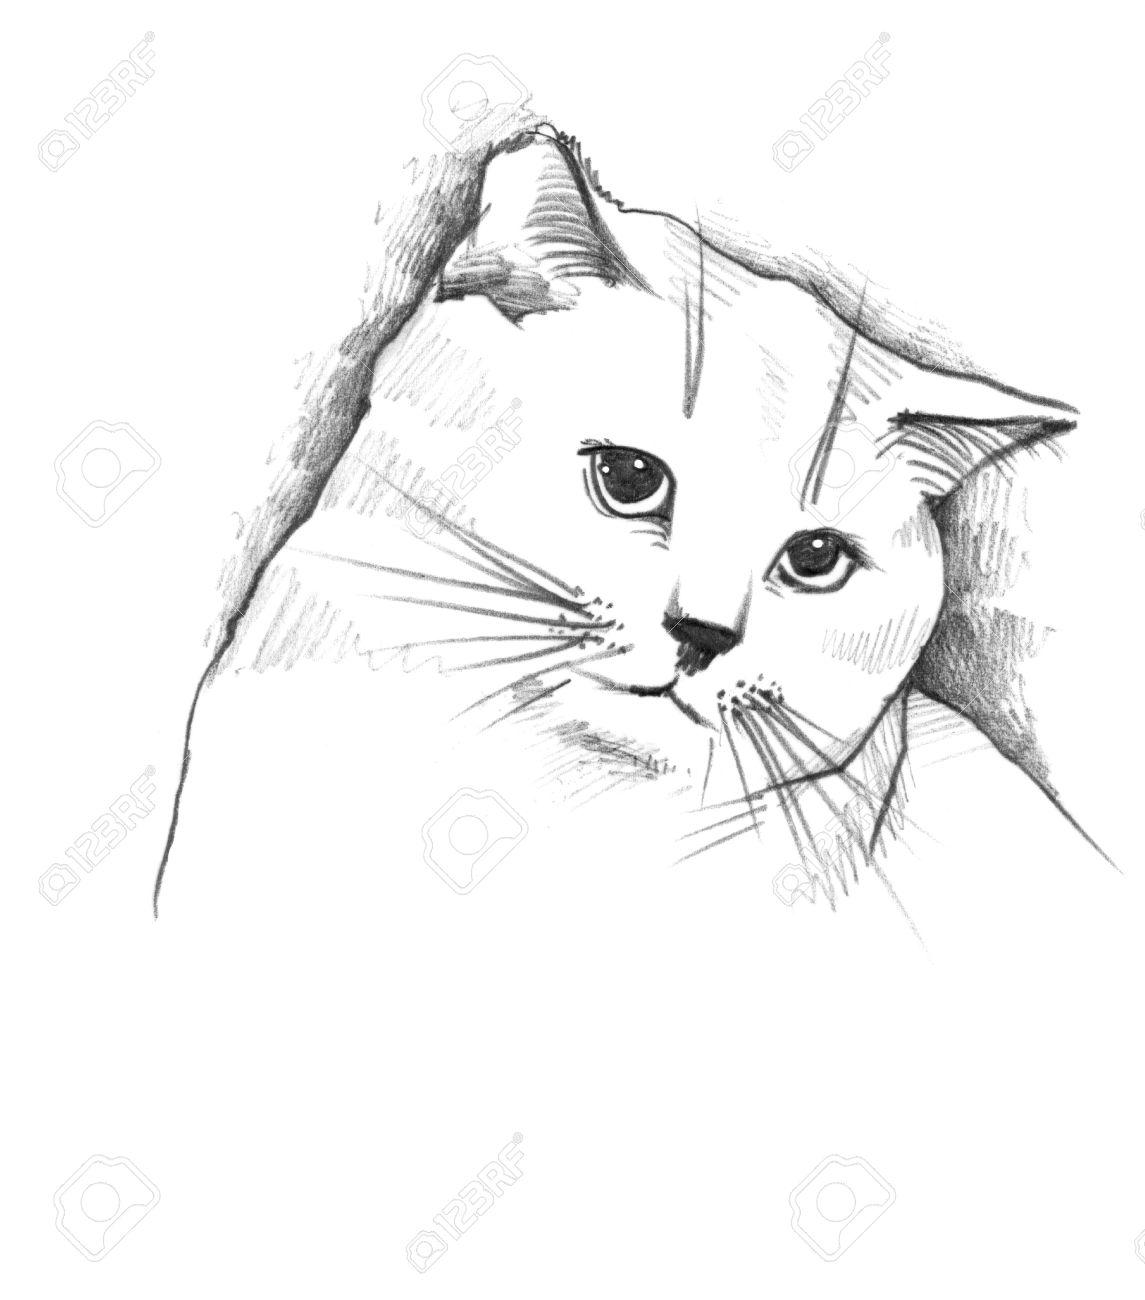 Cat the pencil sketch